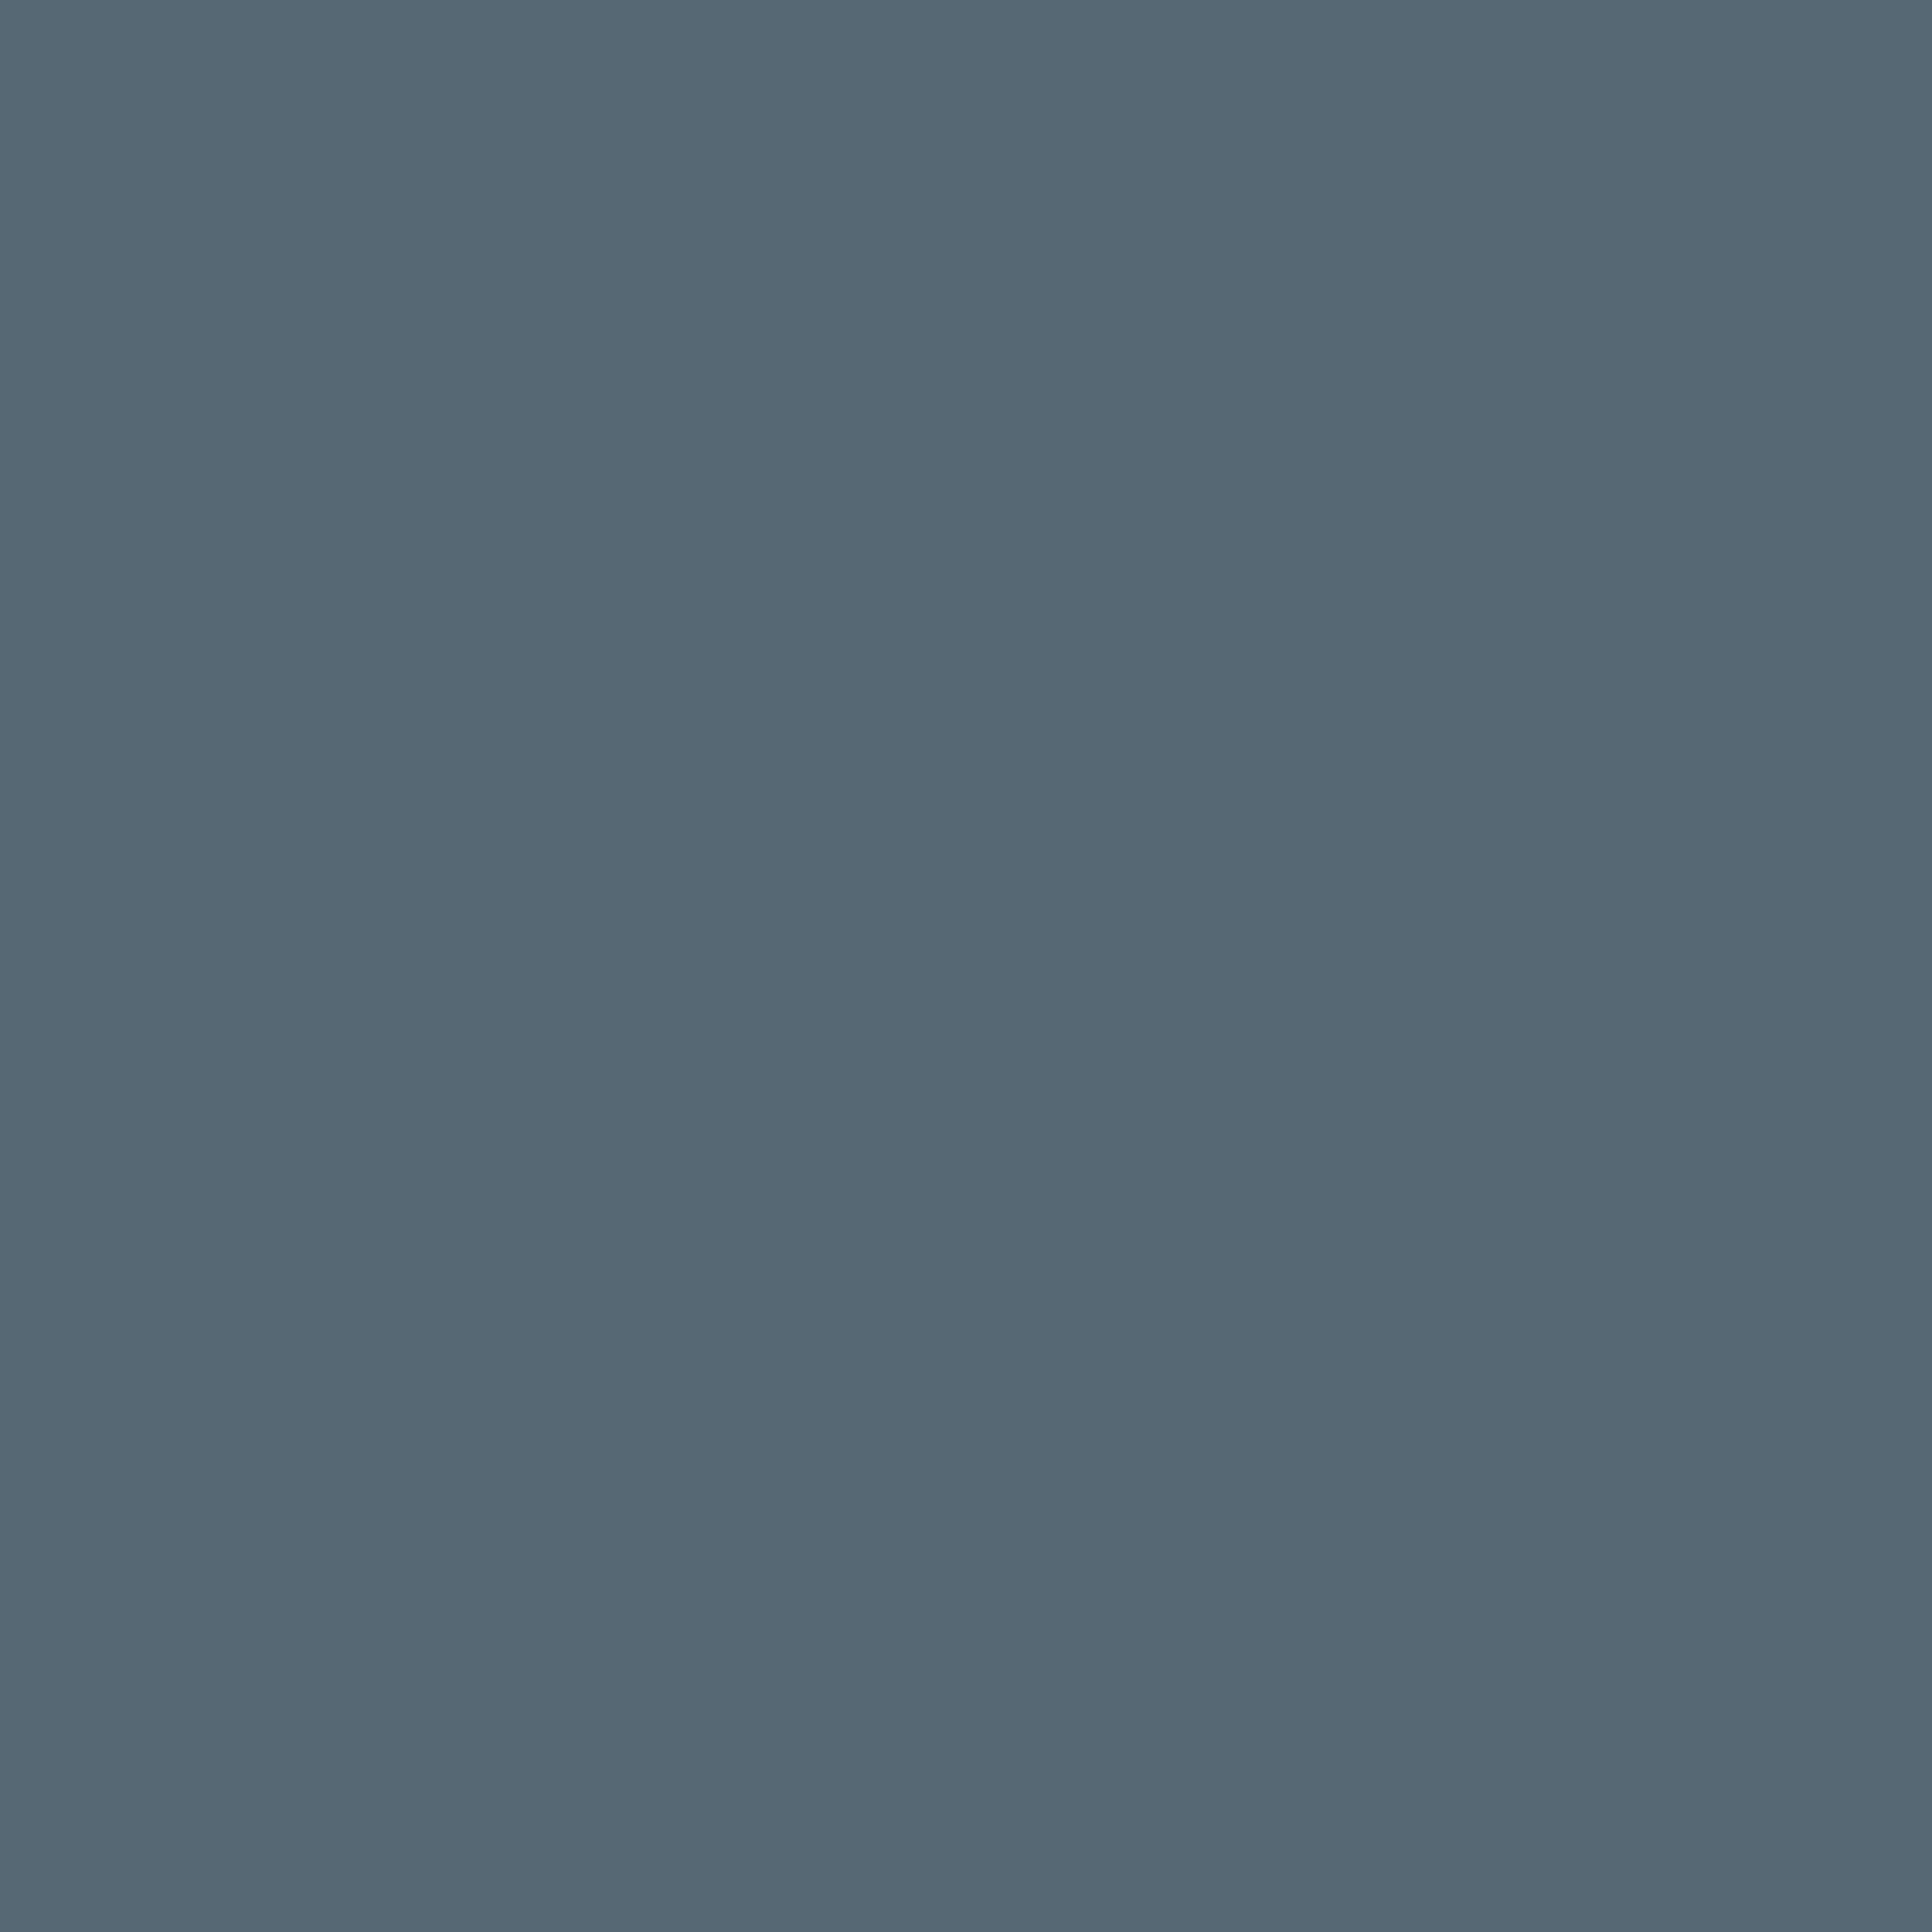 2732x2732 Cadet Solid Color Background